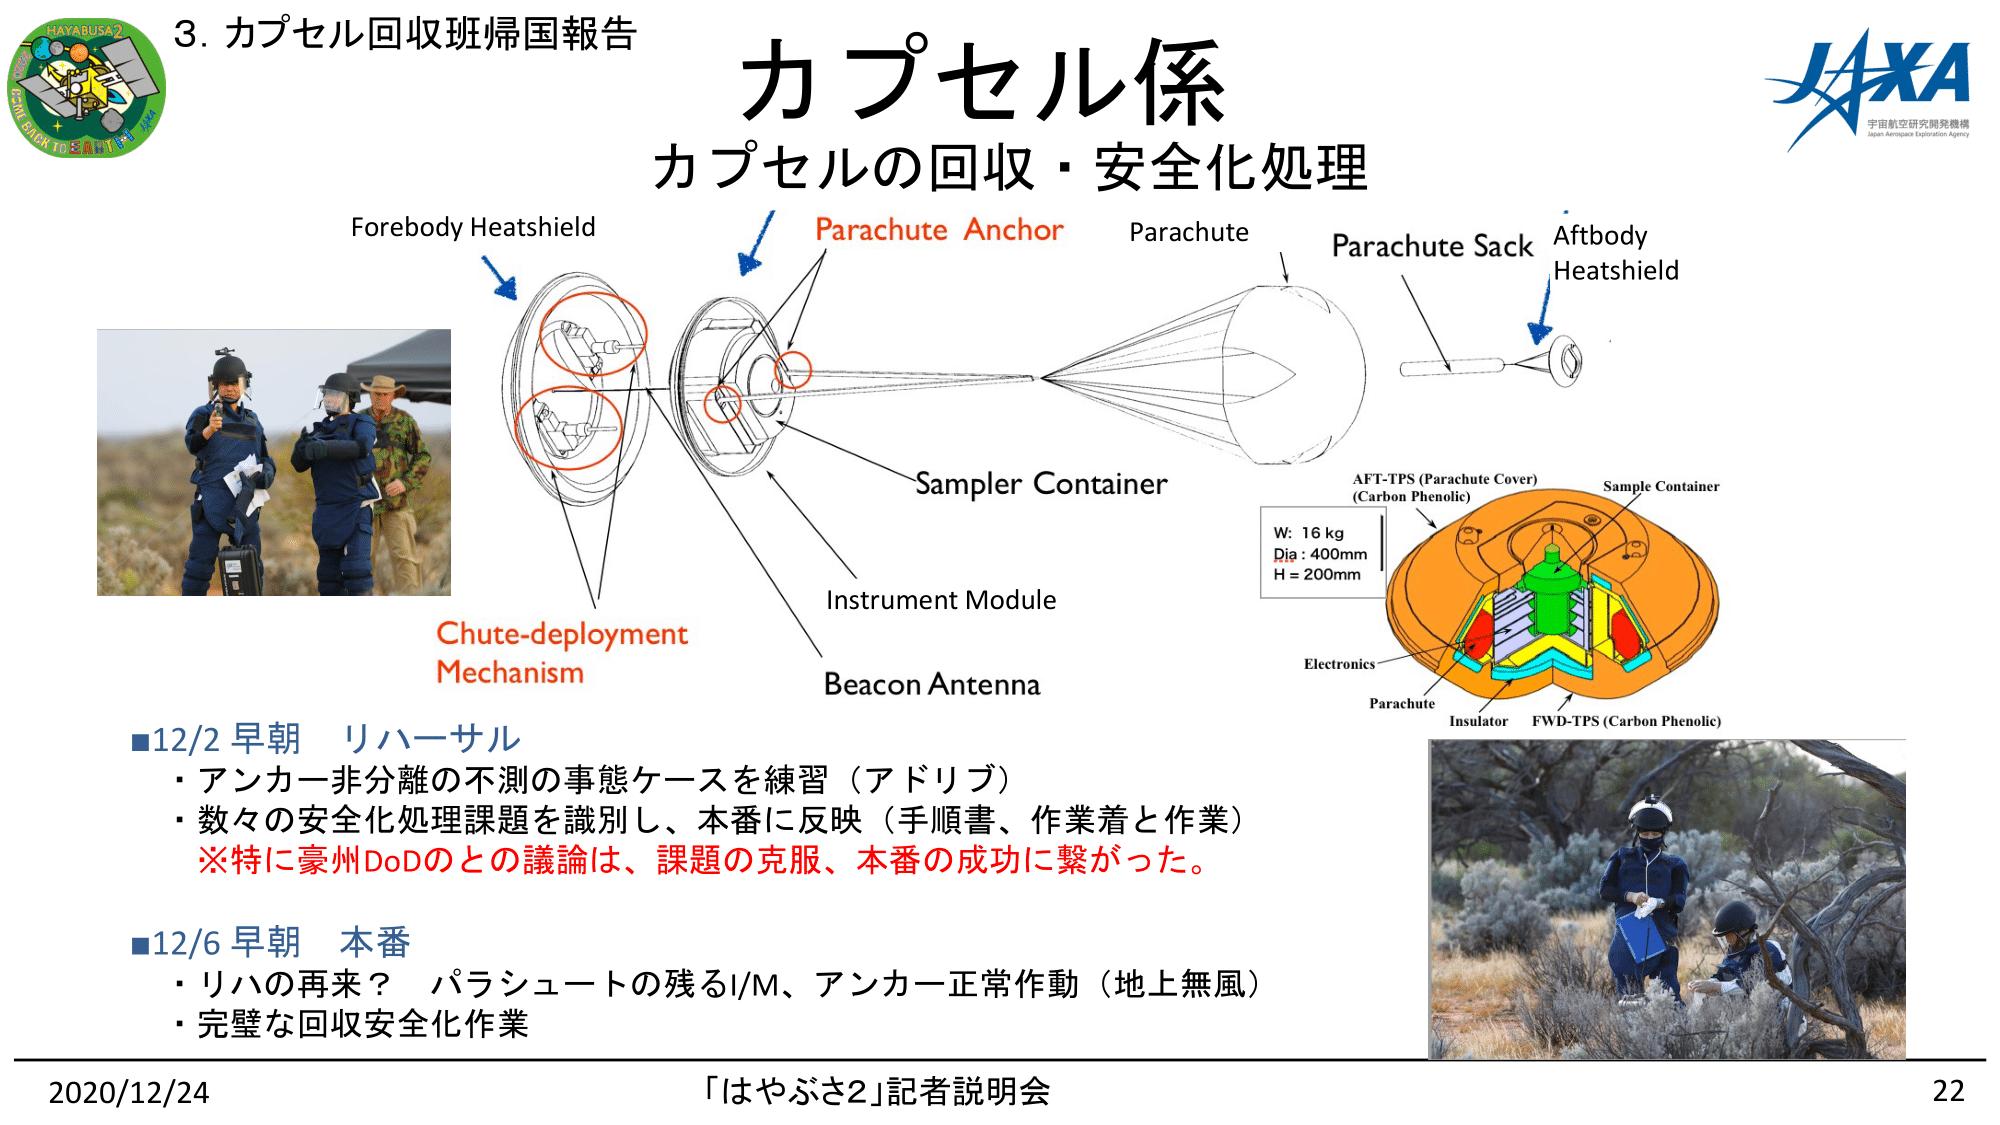 f:id:Imamura:20201224135223p:plain